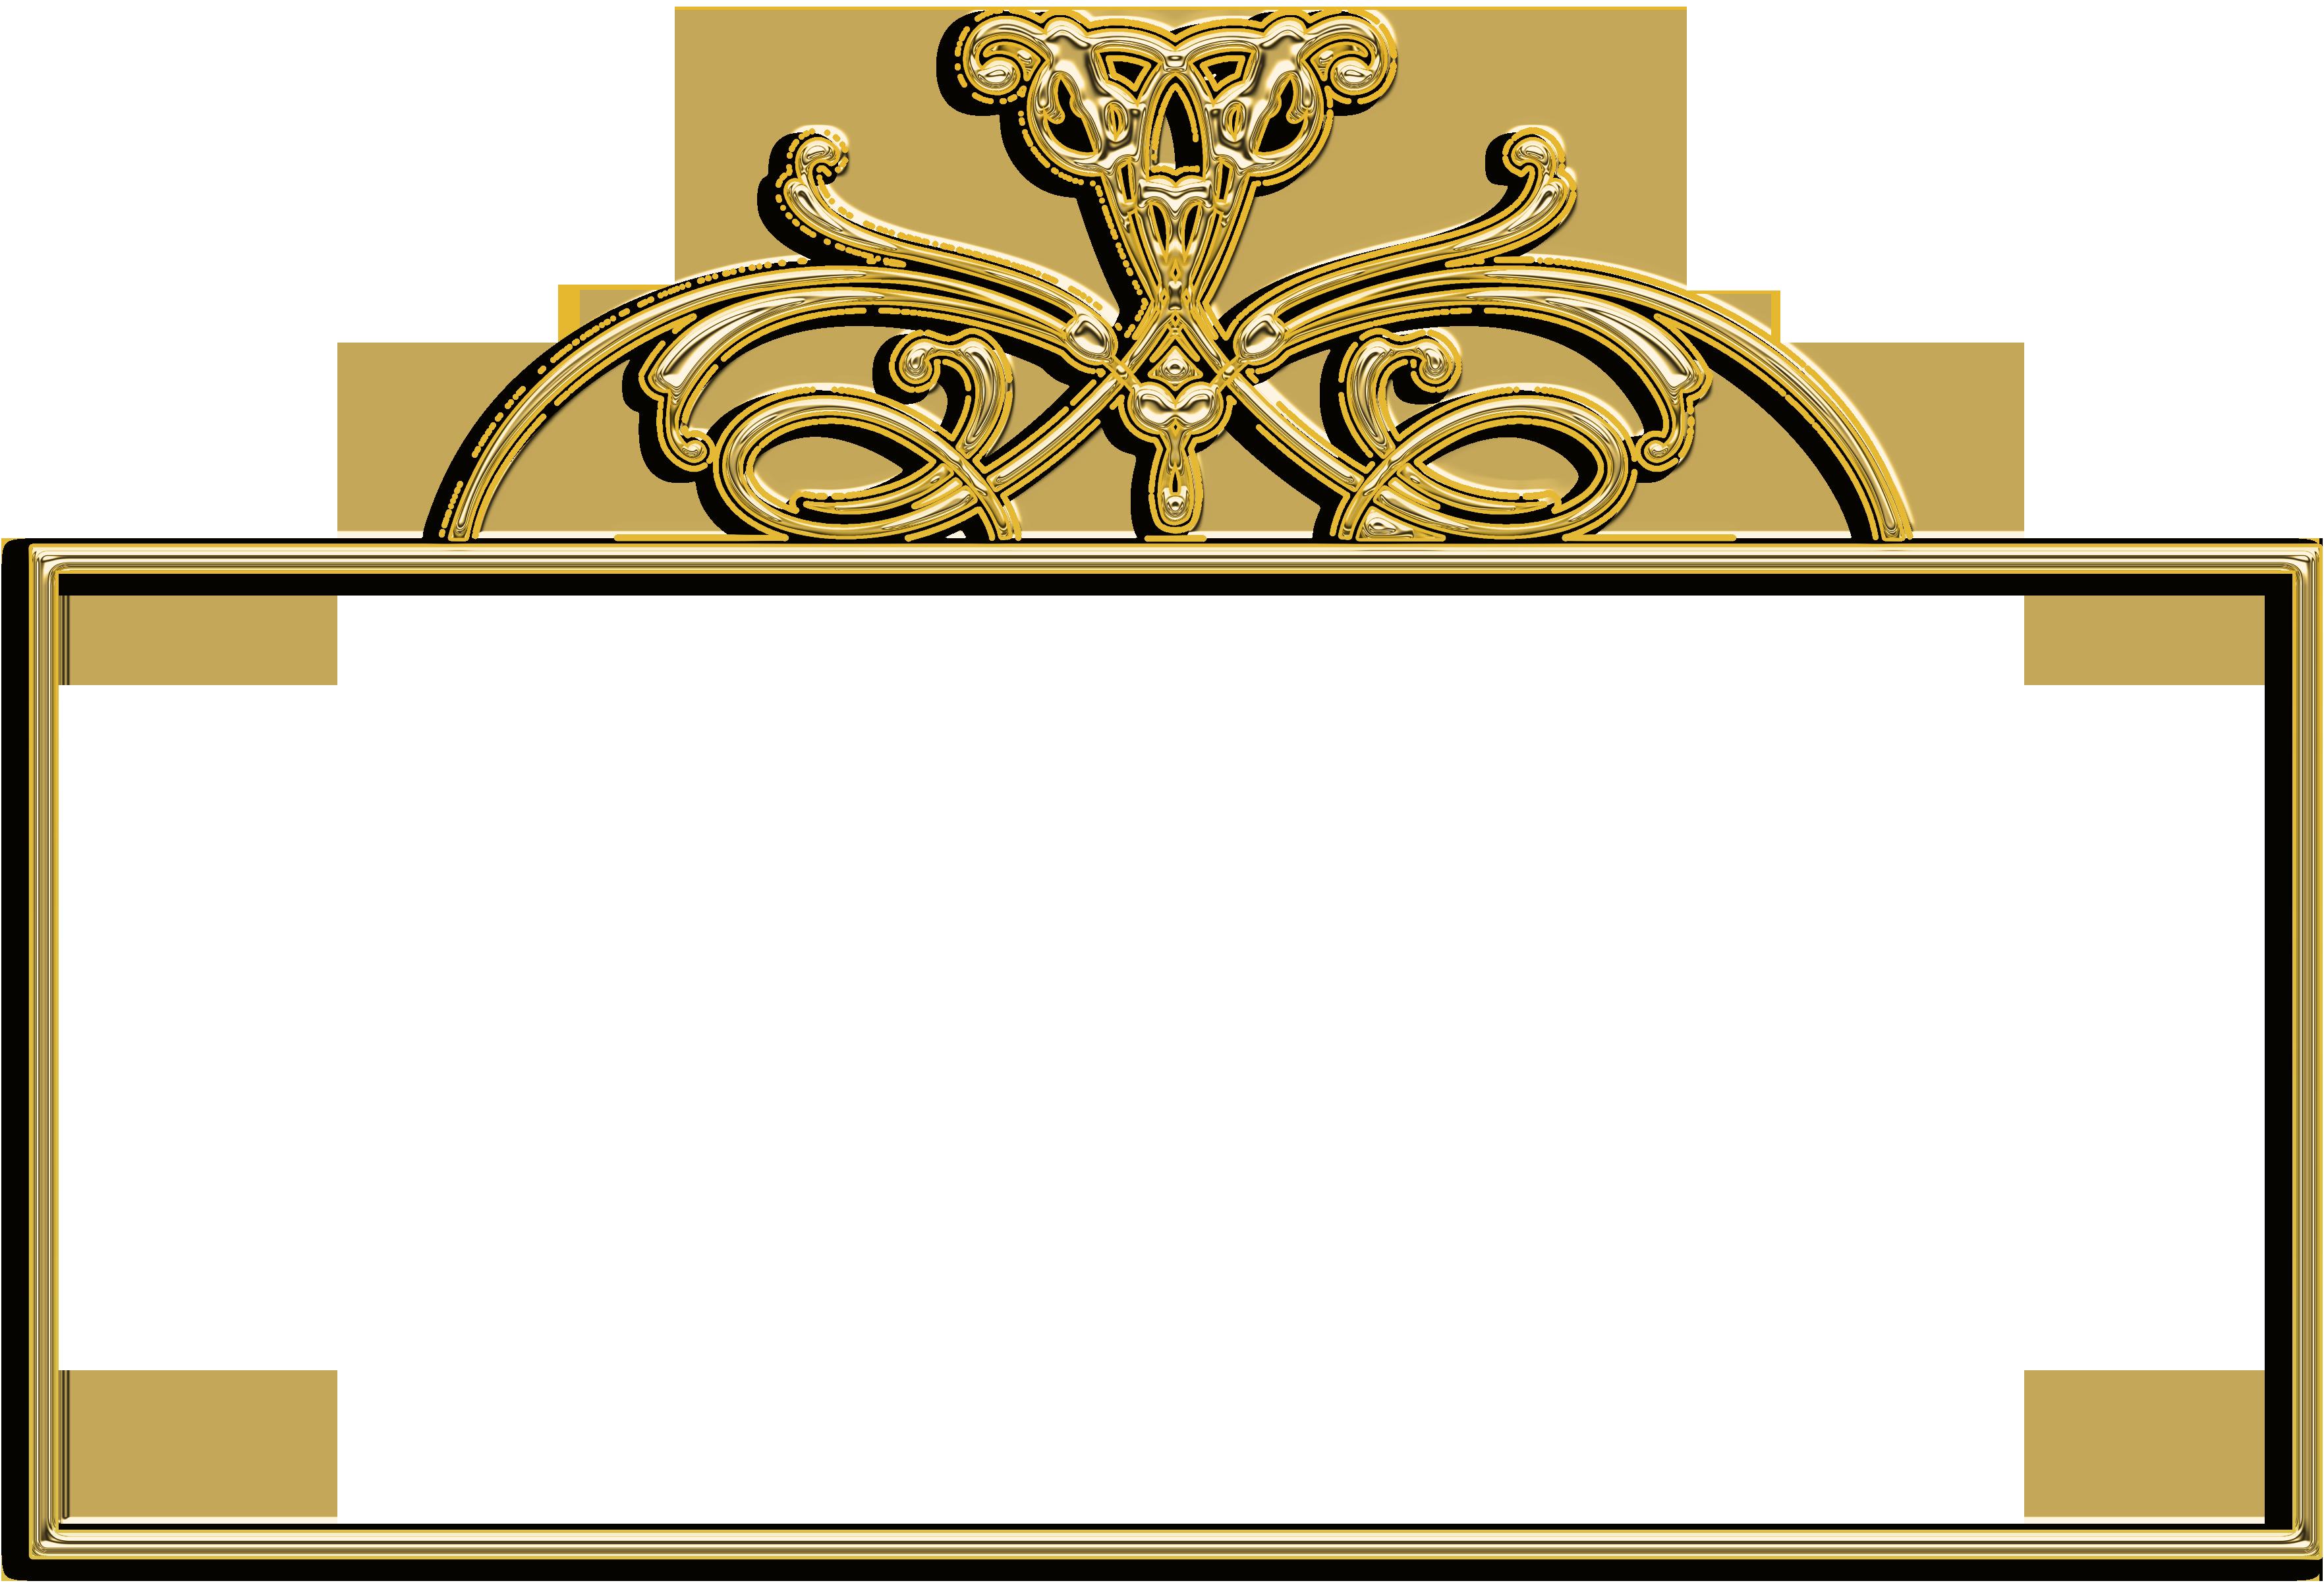 Золотые рамки и виньетки для фотошопа: http://ramki-photoshop.ru/zolotye-ramki.html